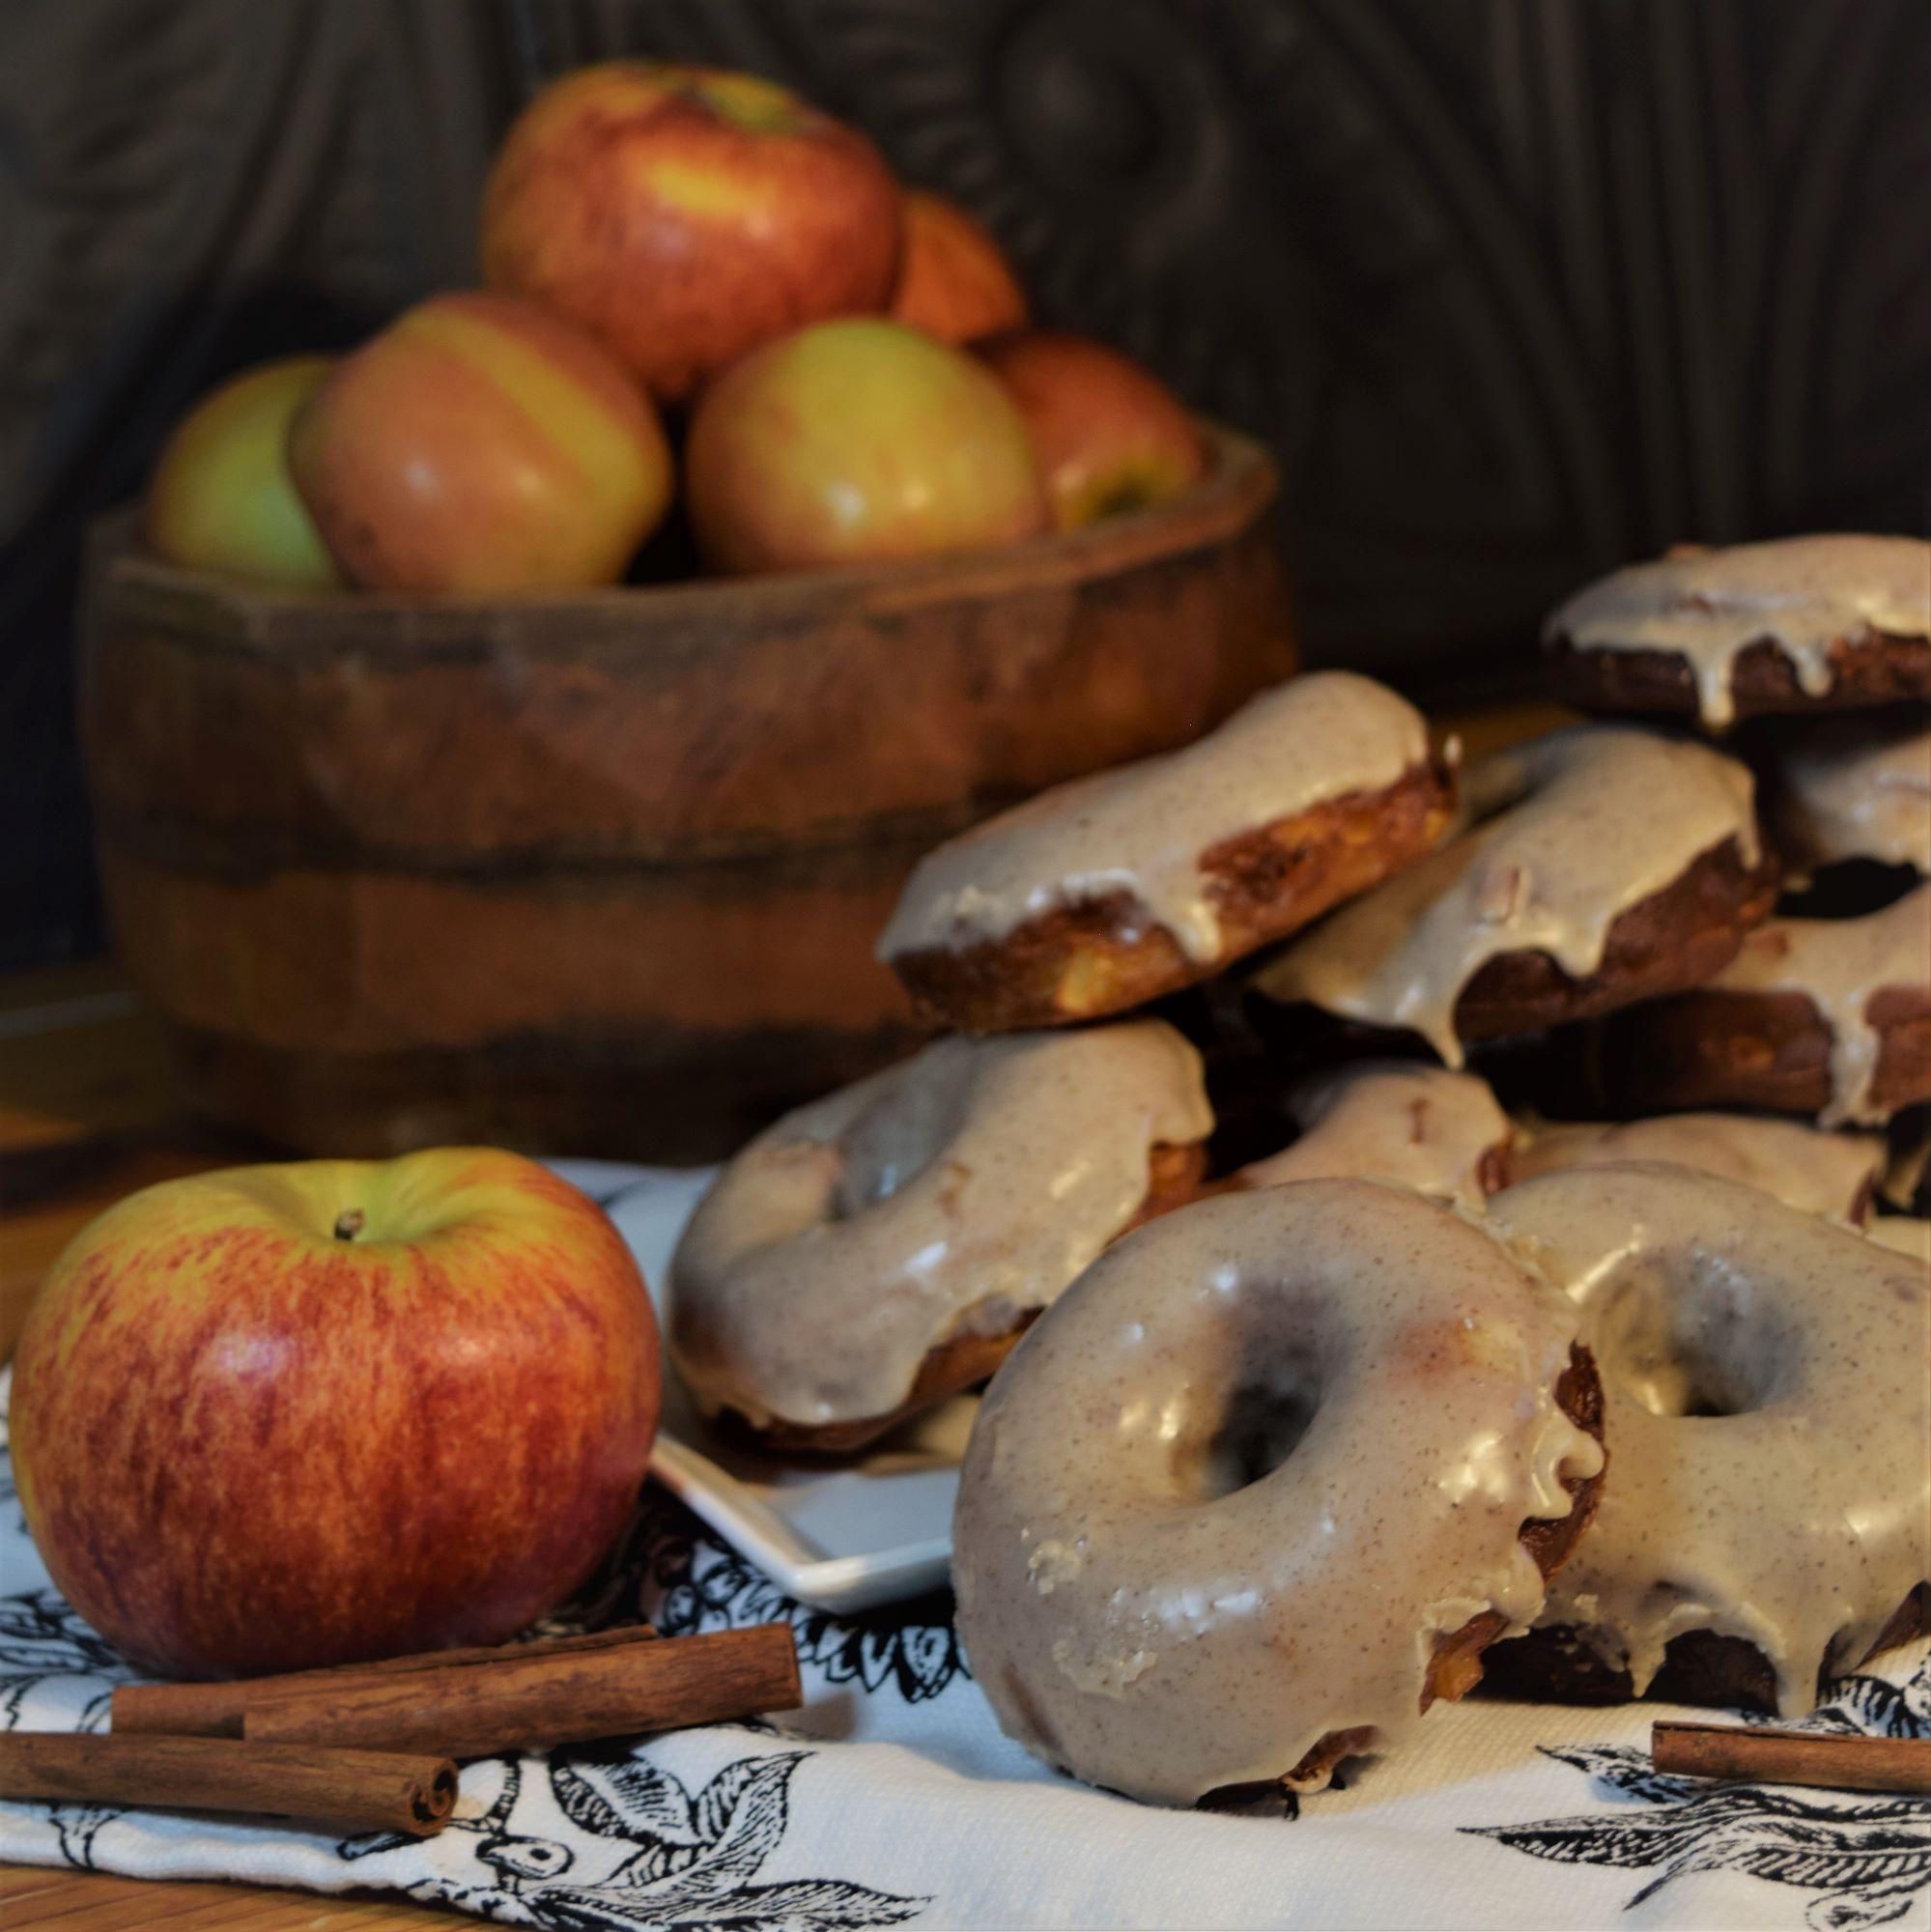 apple cider donuts fall recipe dessert apple wood black cinnamon sticks cozy baking